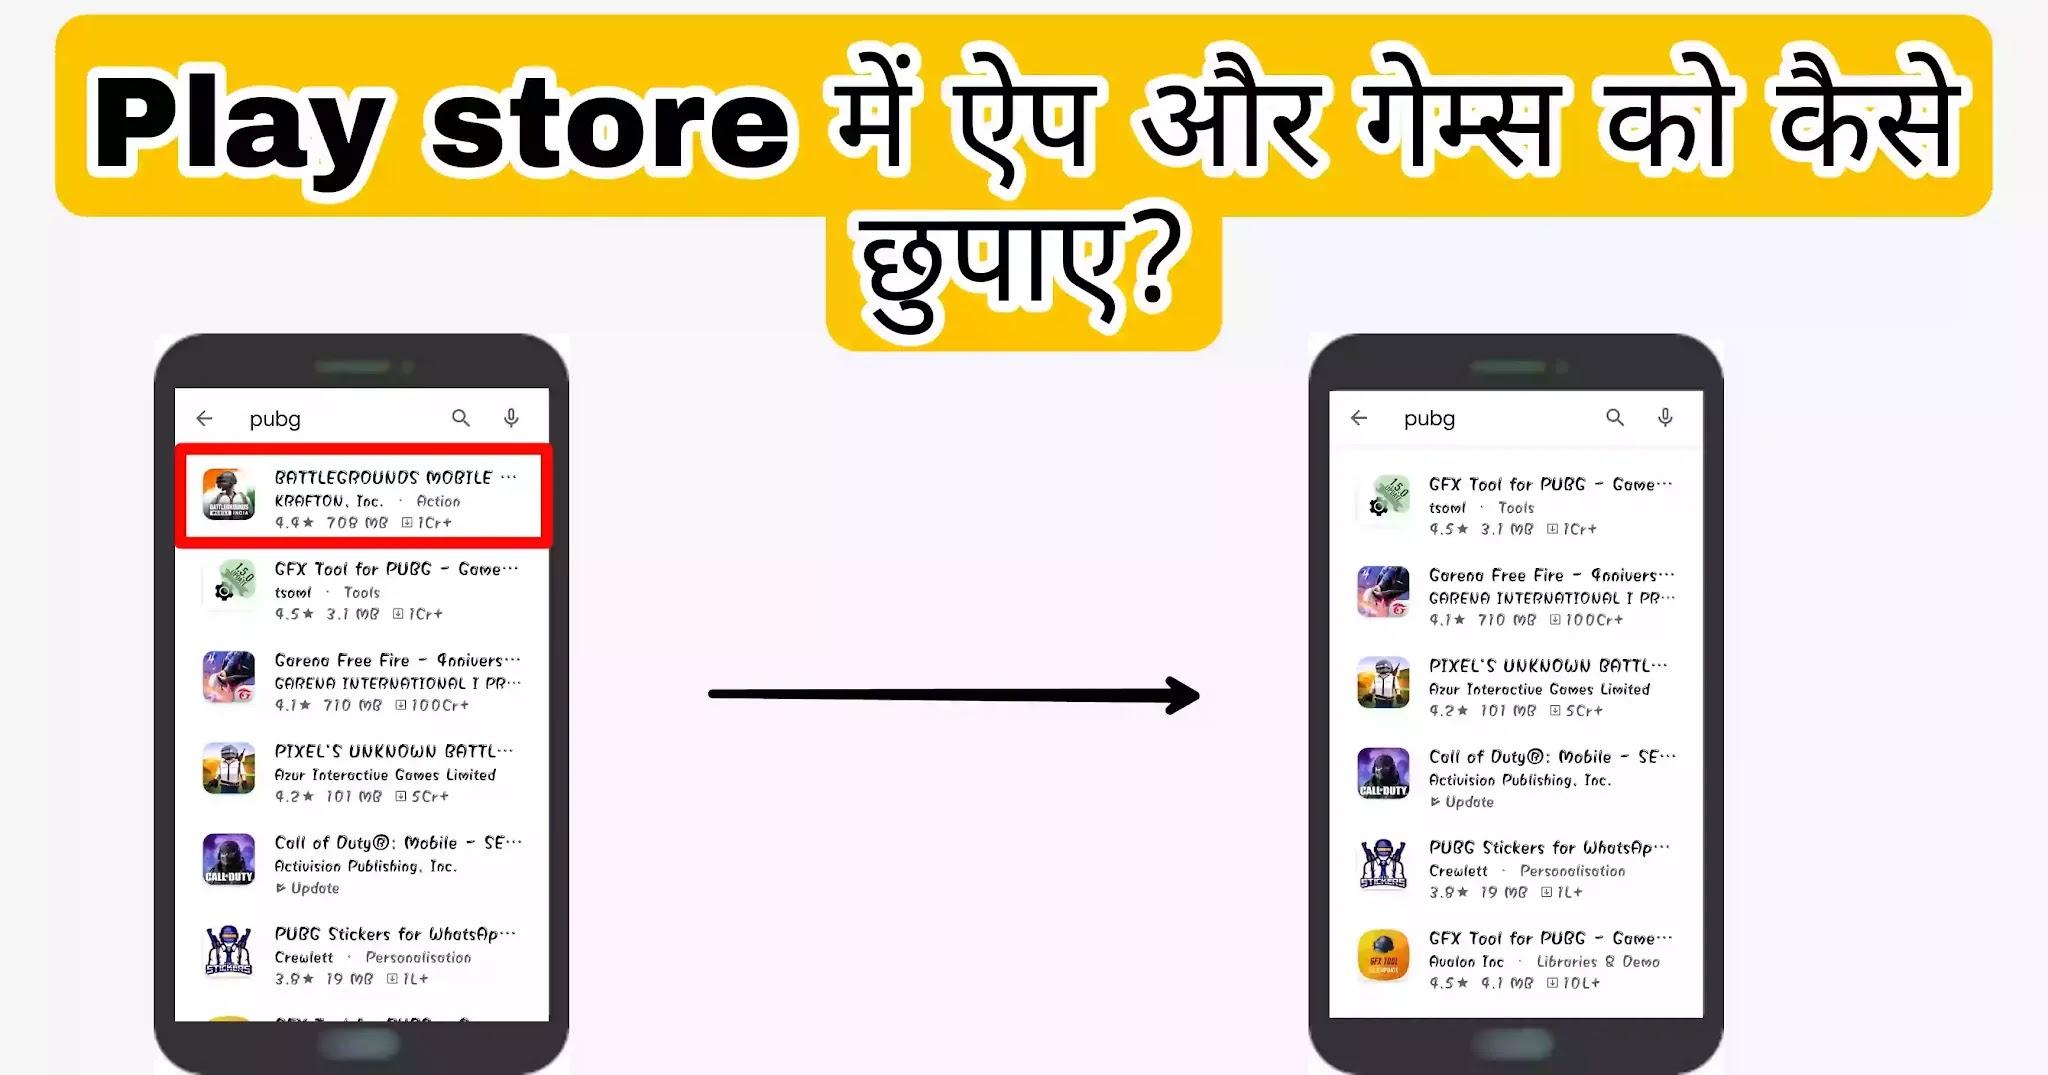 Play-store-me-app-aur-games-kaise-chupaye